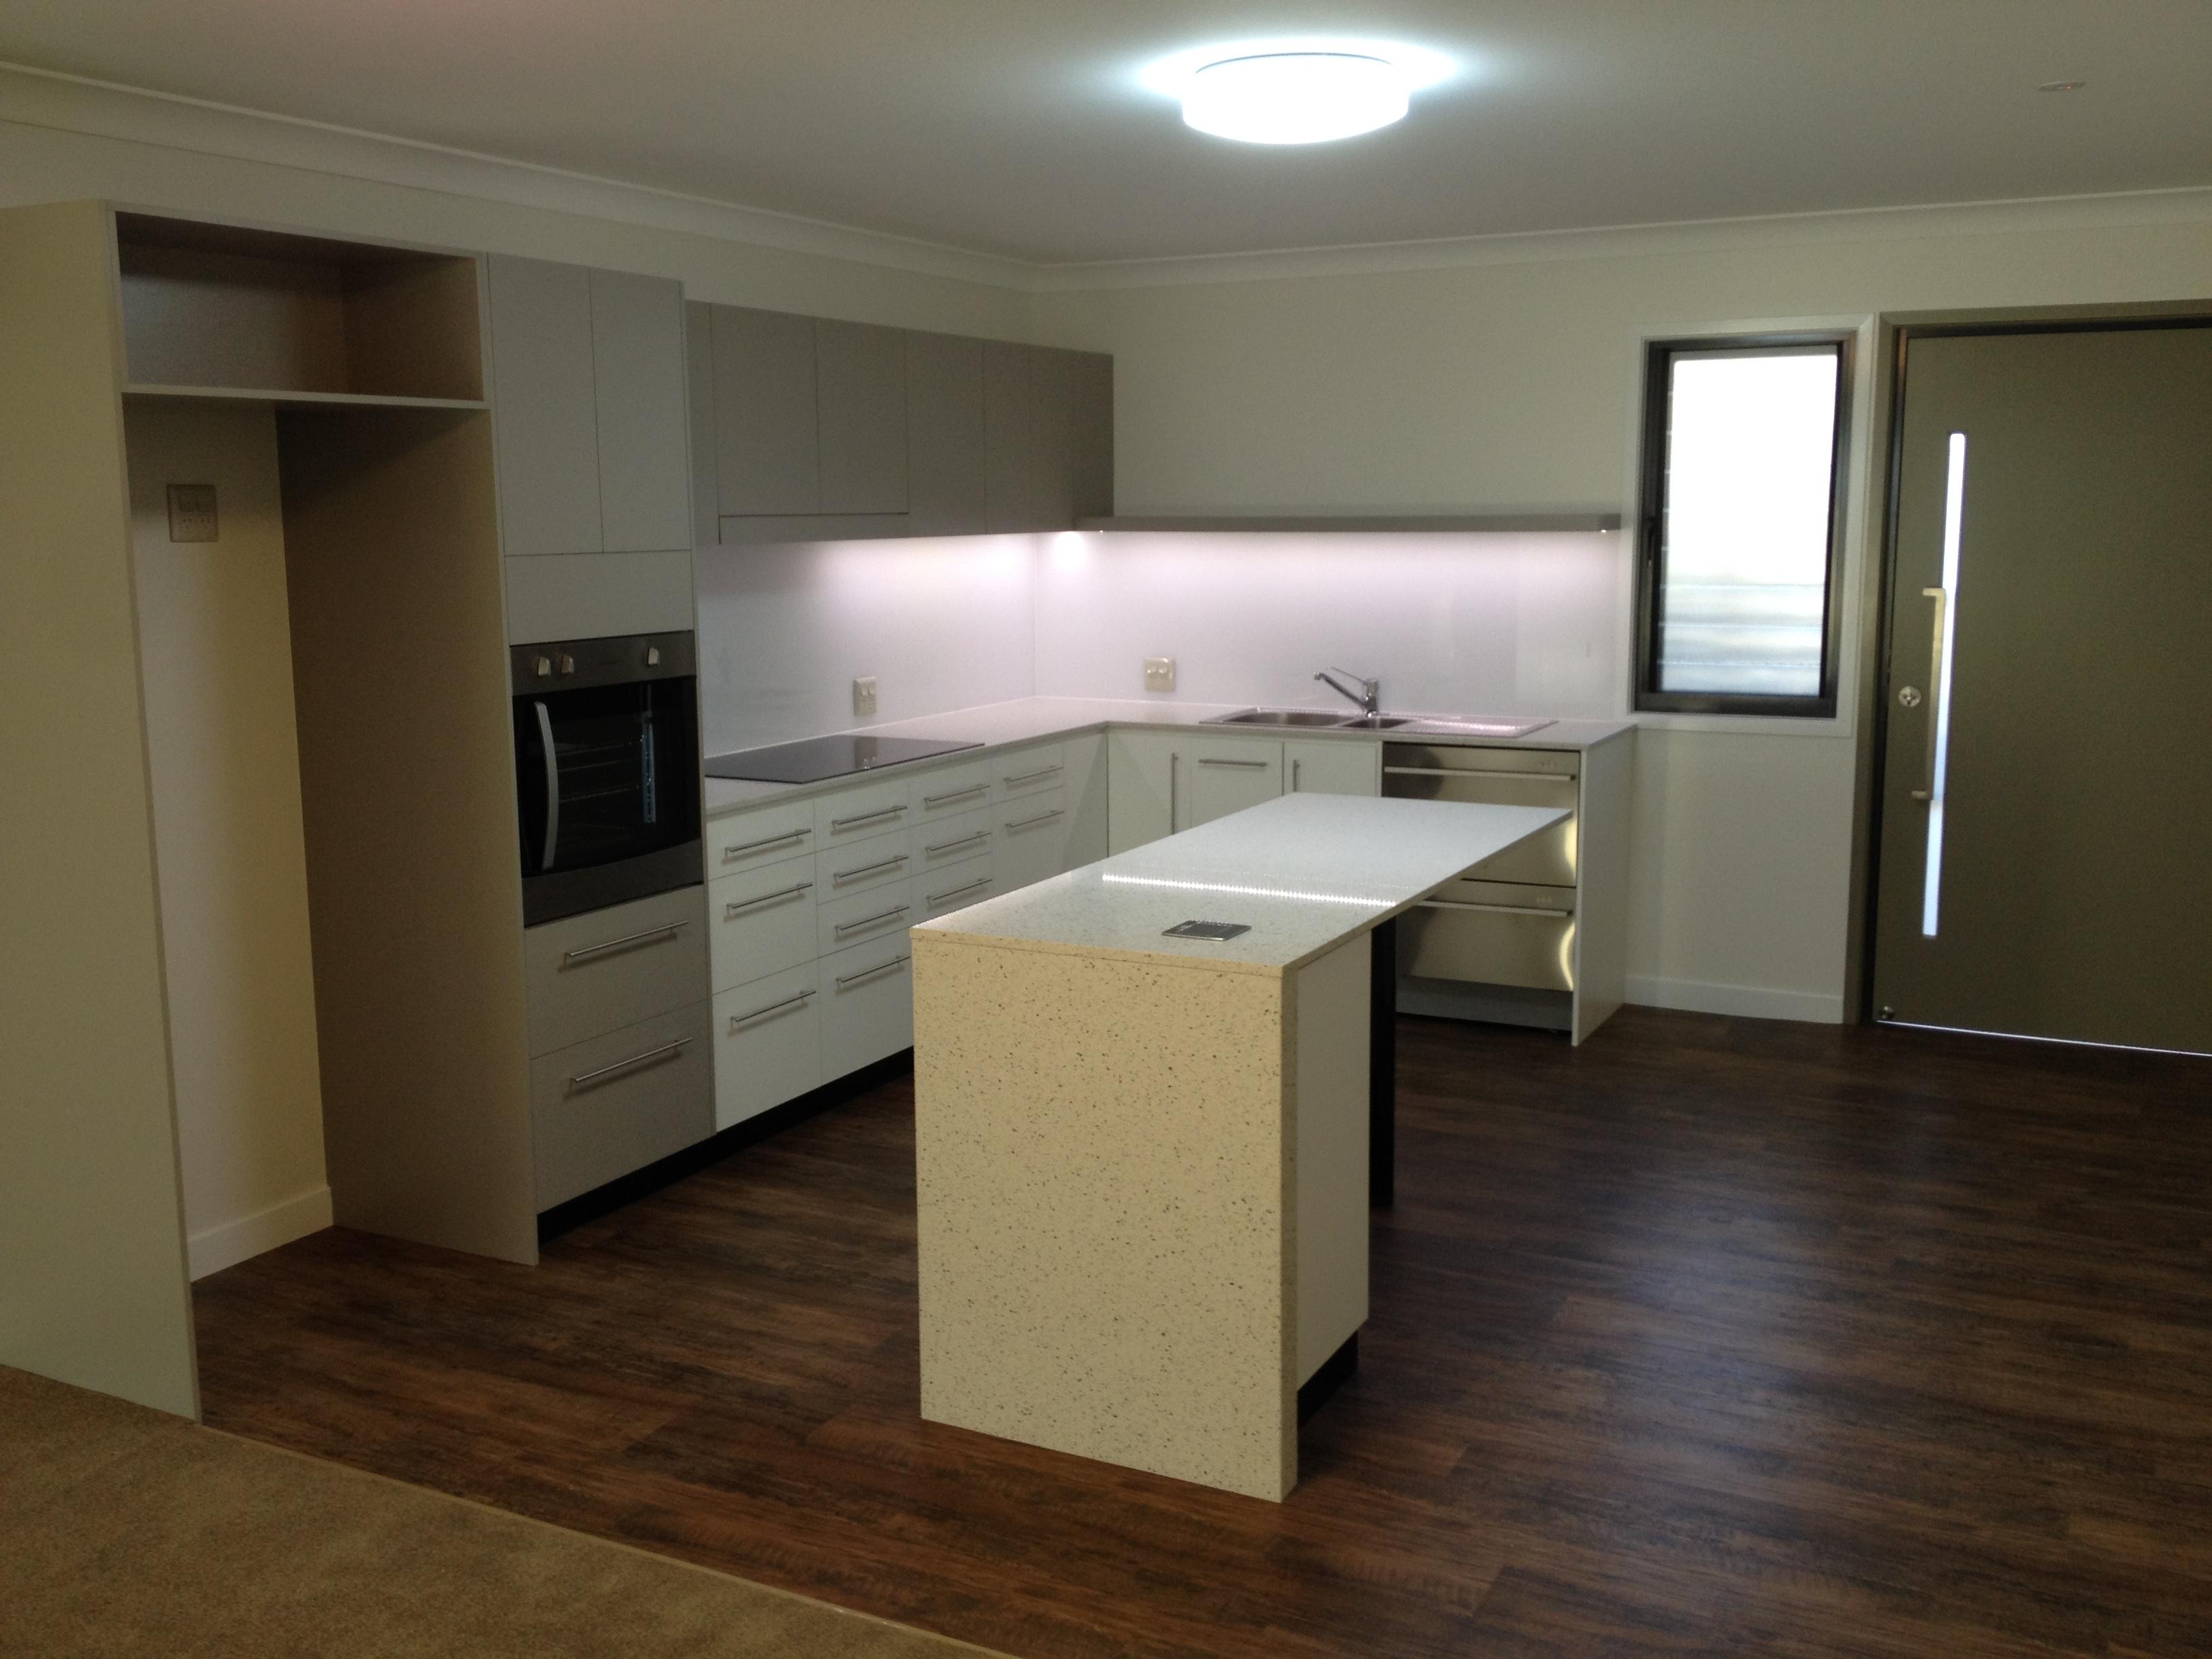 Endeavour - Adaptable Kitchen